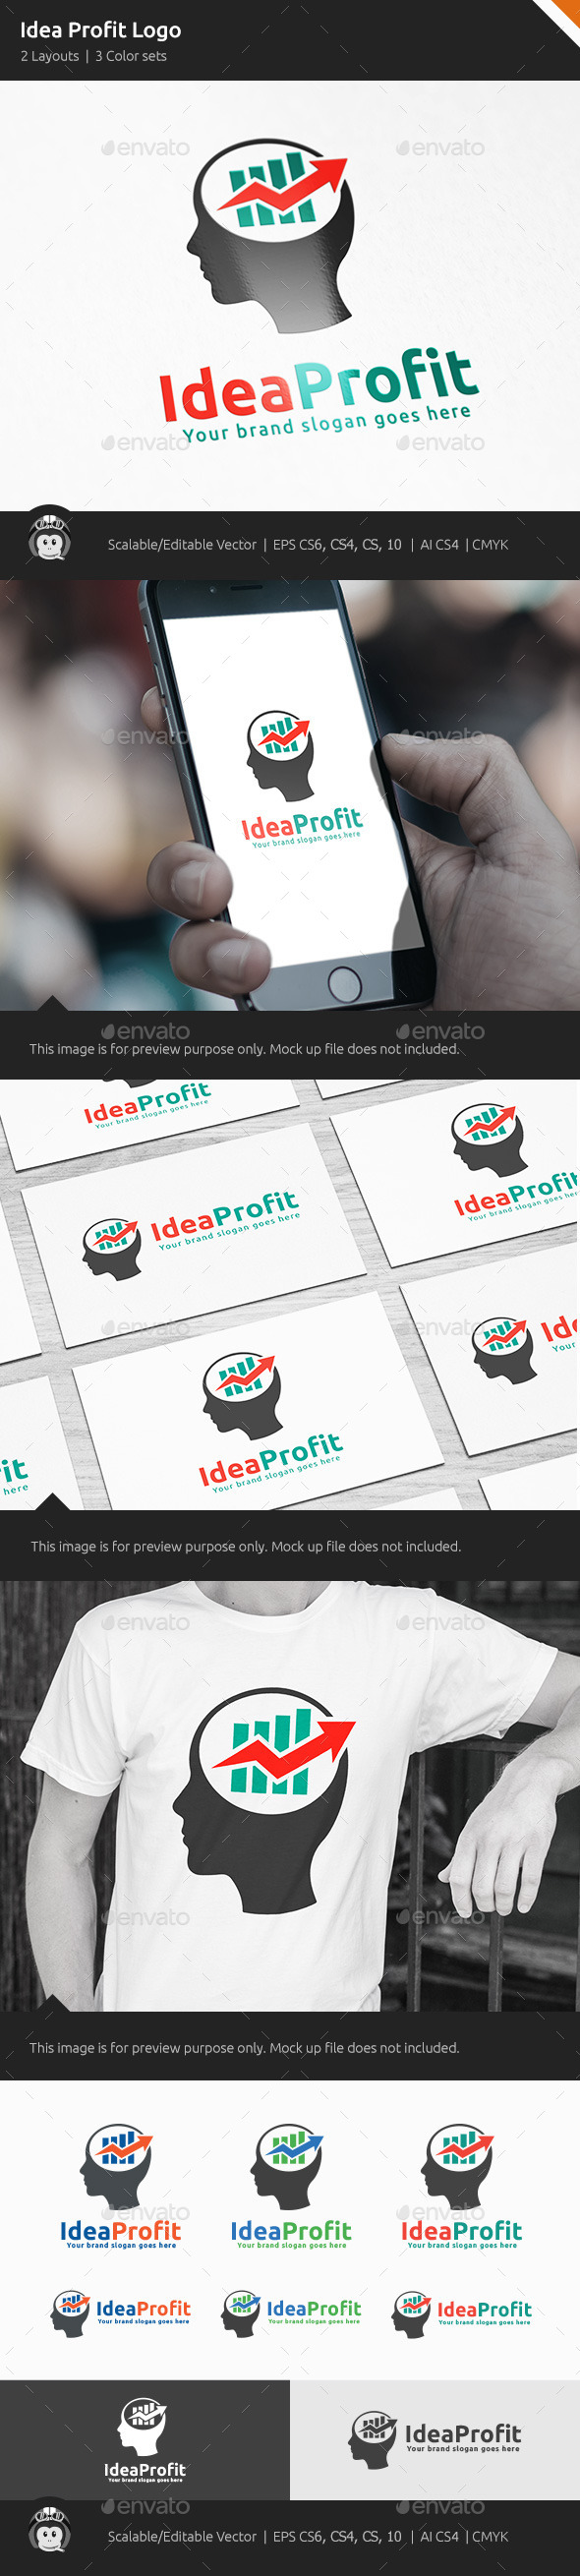 GraphicRiver Idea Profit Marketing Logo 10542966